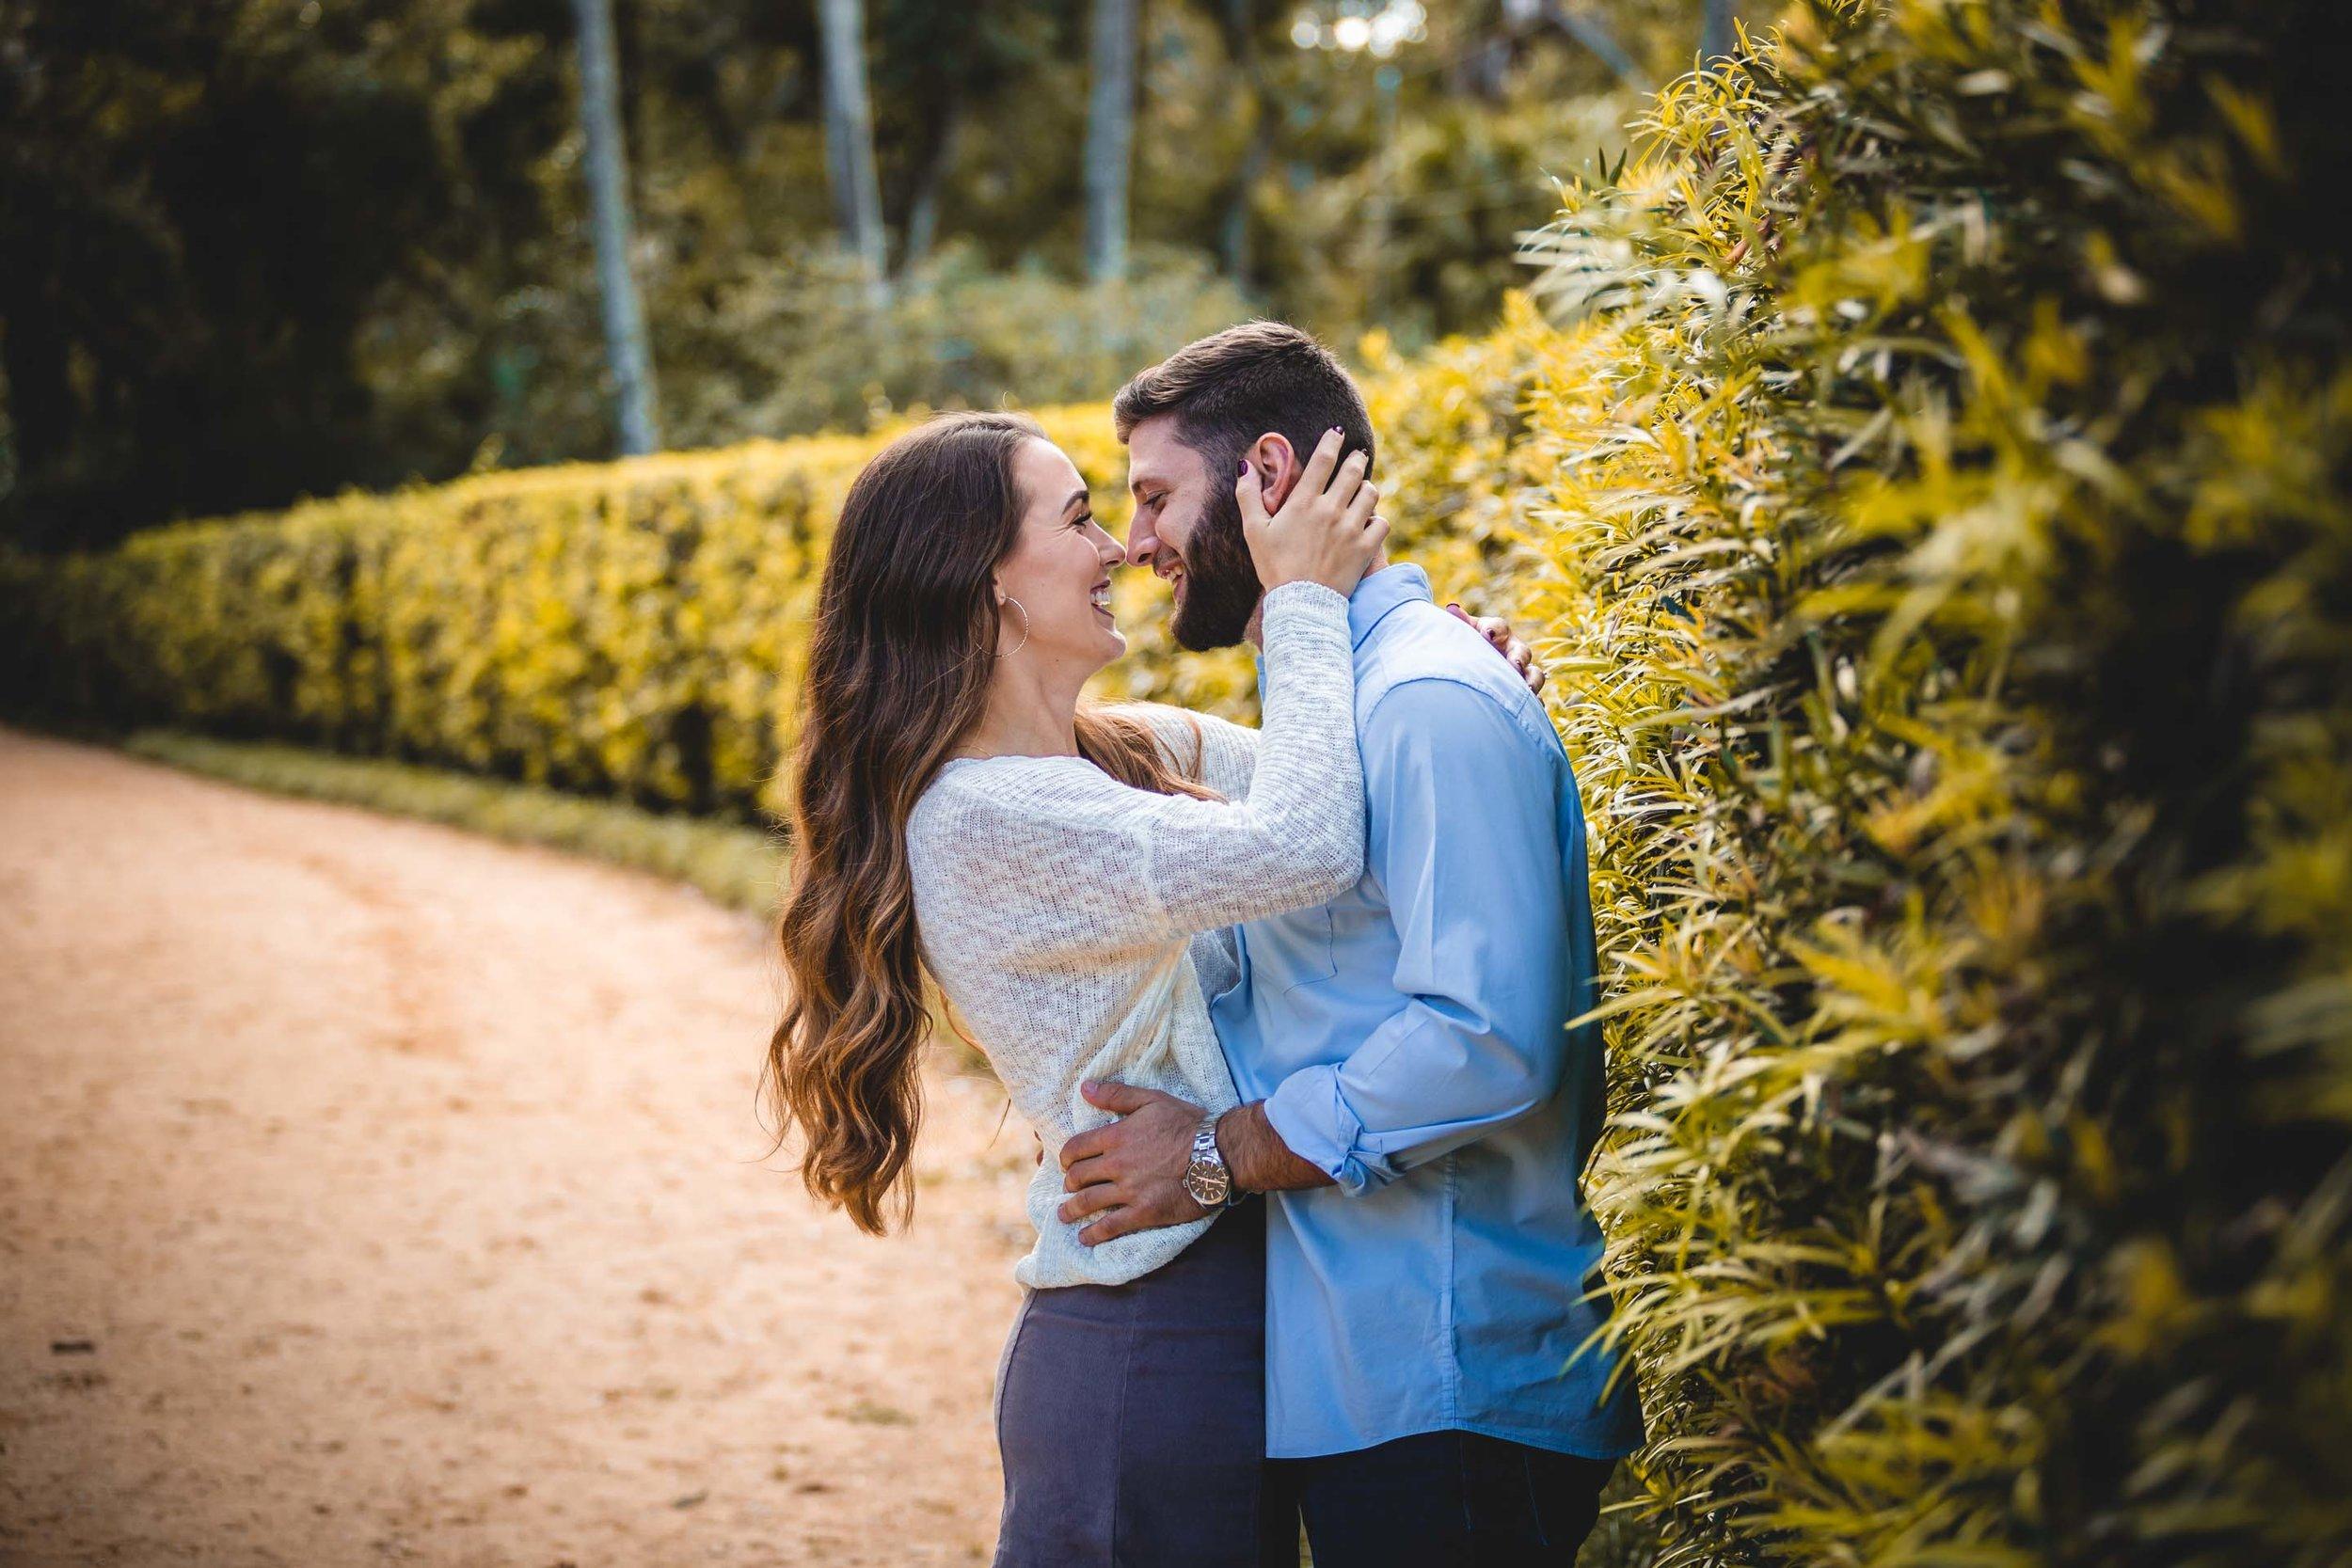 adam-szarmack-jacksonville-wedding-photographer-palm-coast-washing-oaks-garden-state-park-engagement-12.jpg